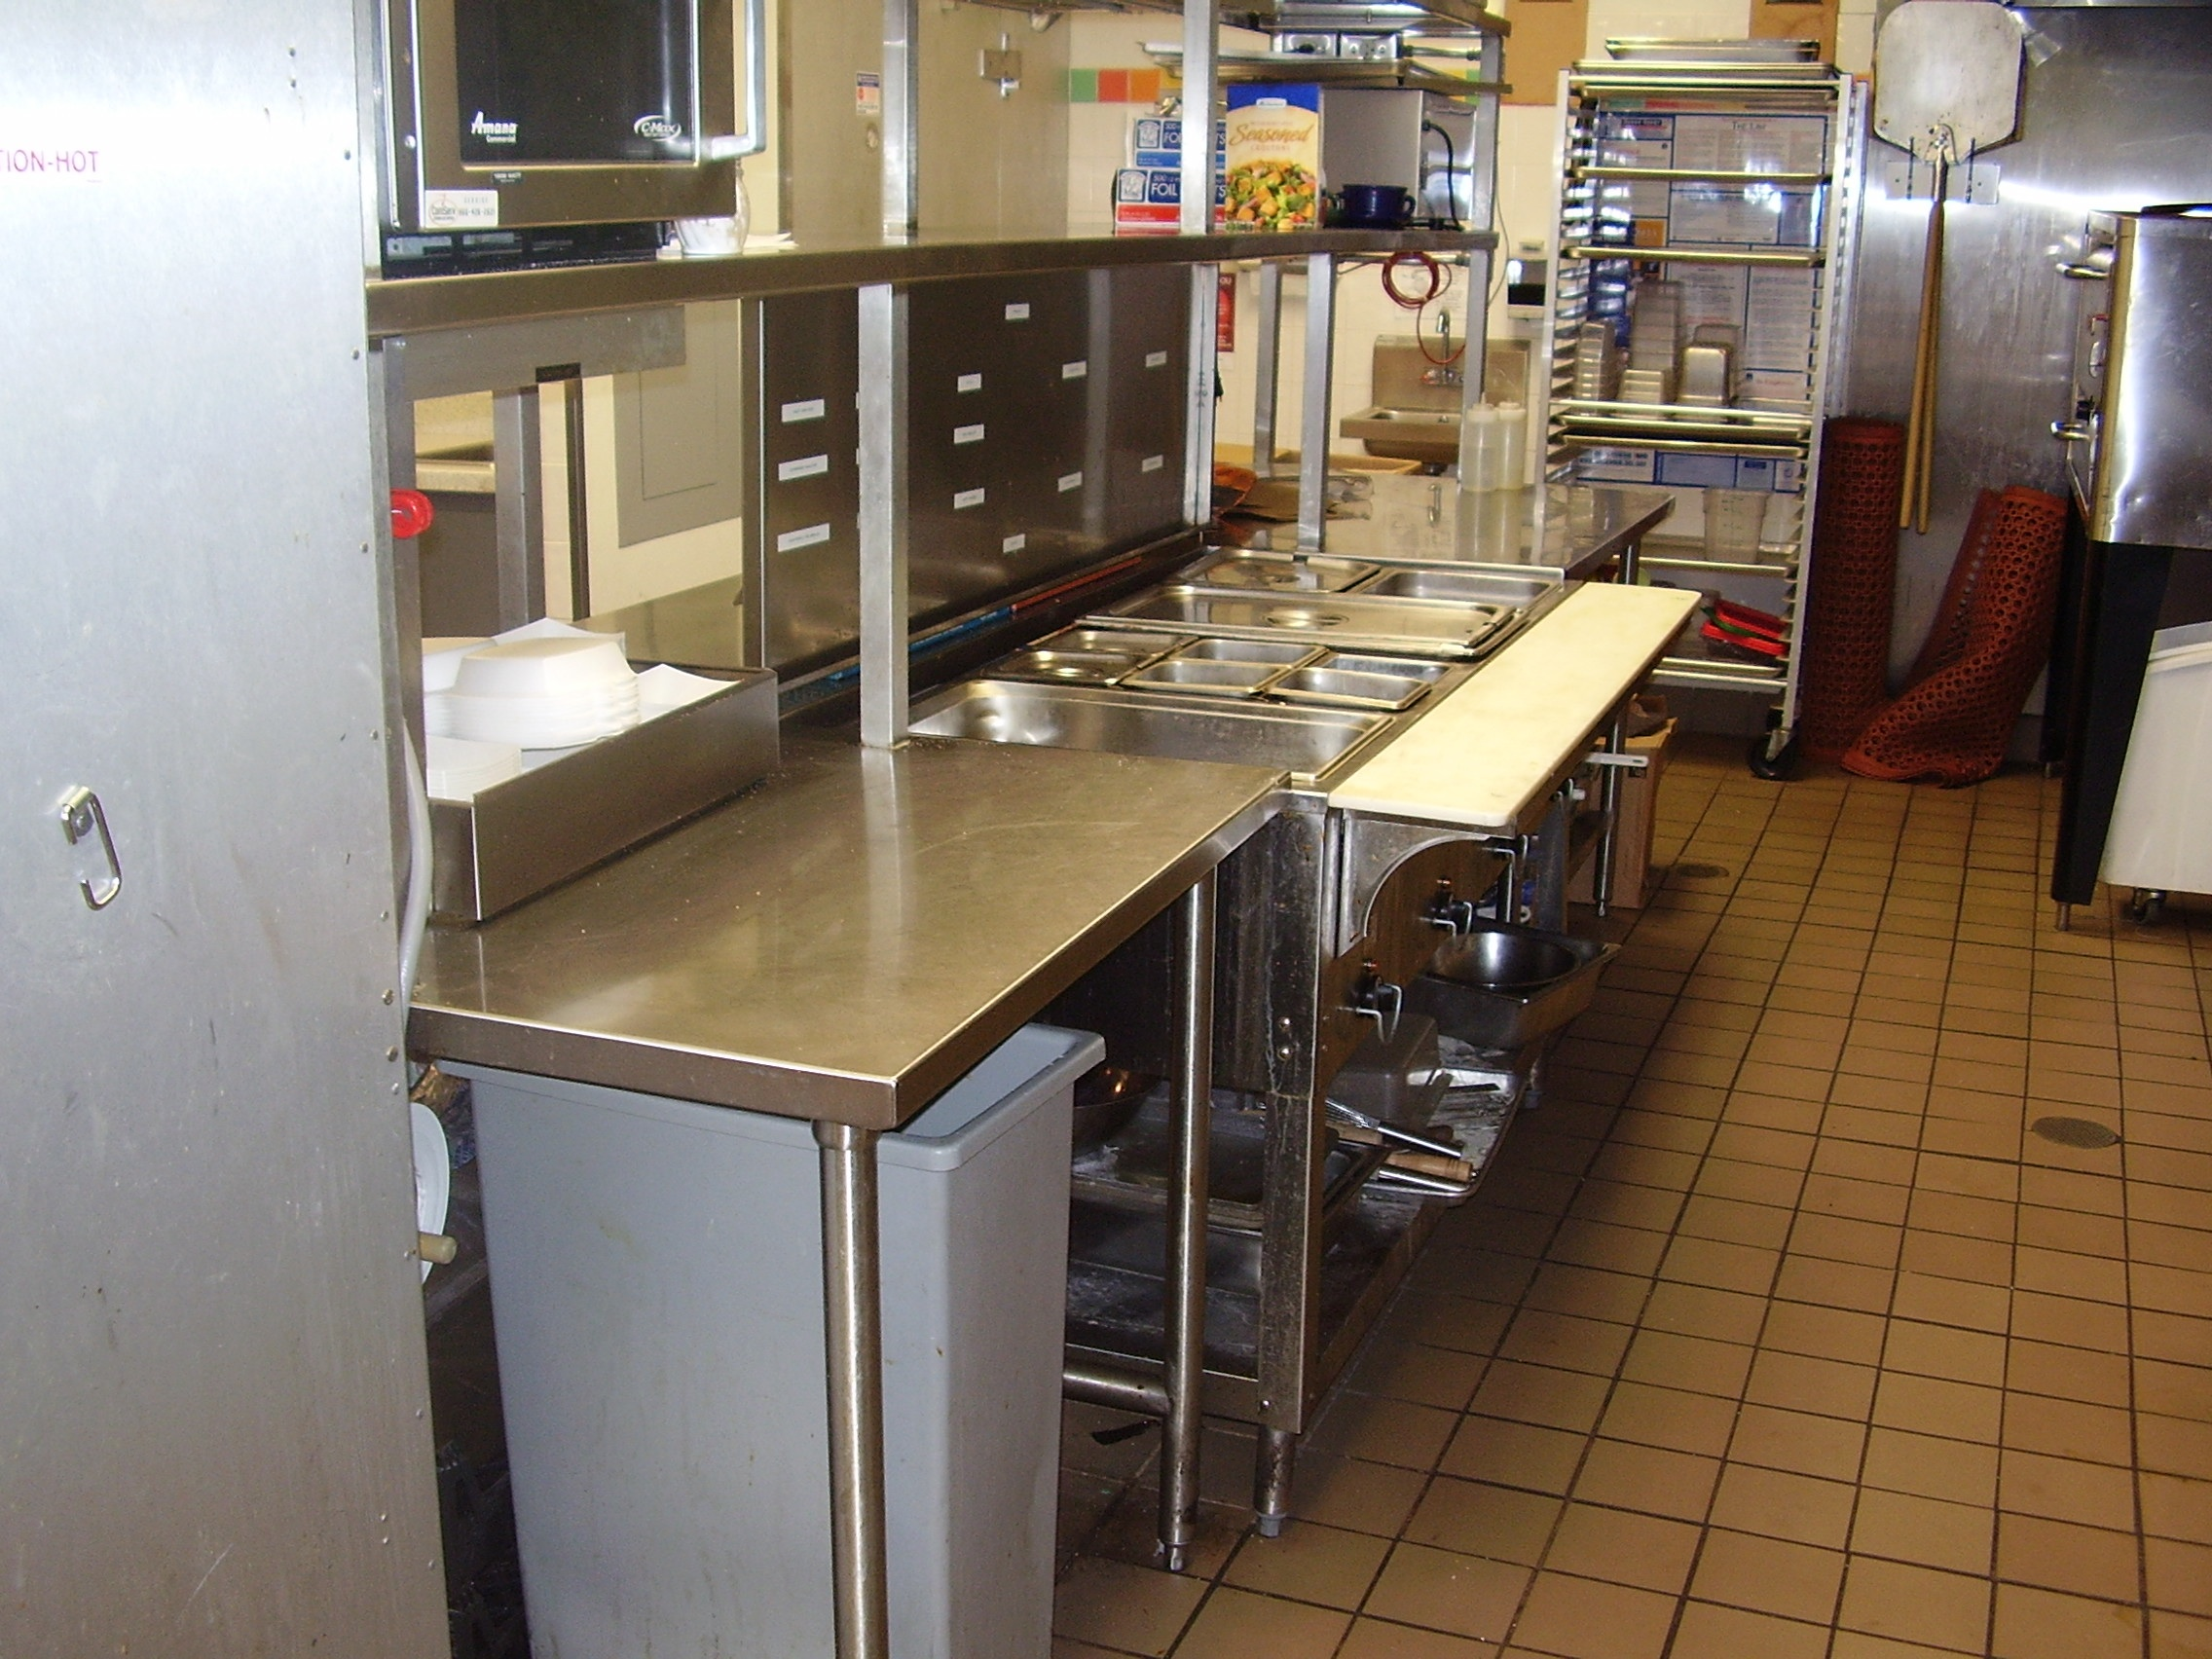 Comrestaurant Kitchen Equipment : restaurant equipment for sale  One Fat Frog